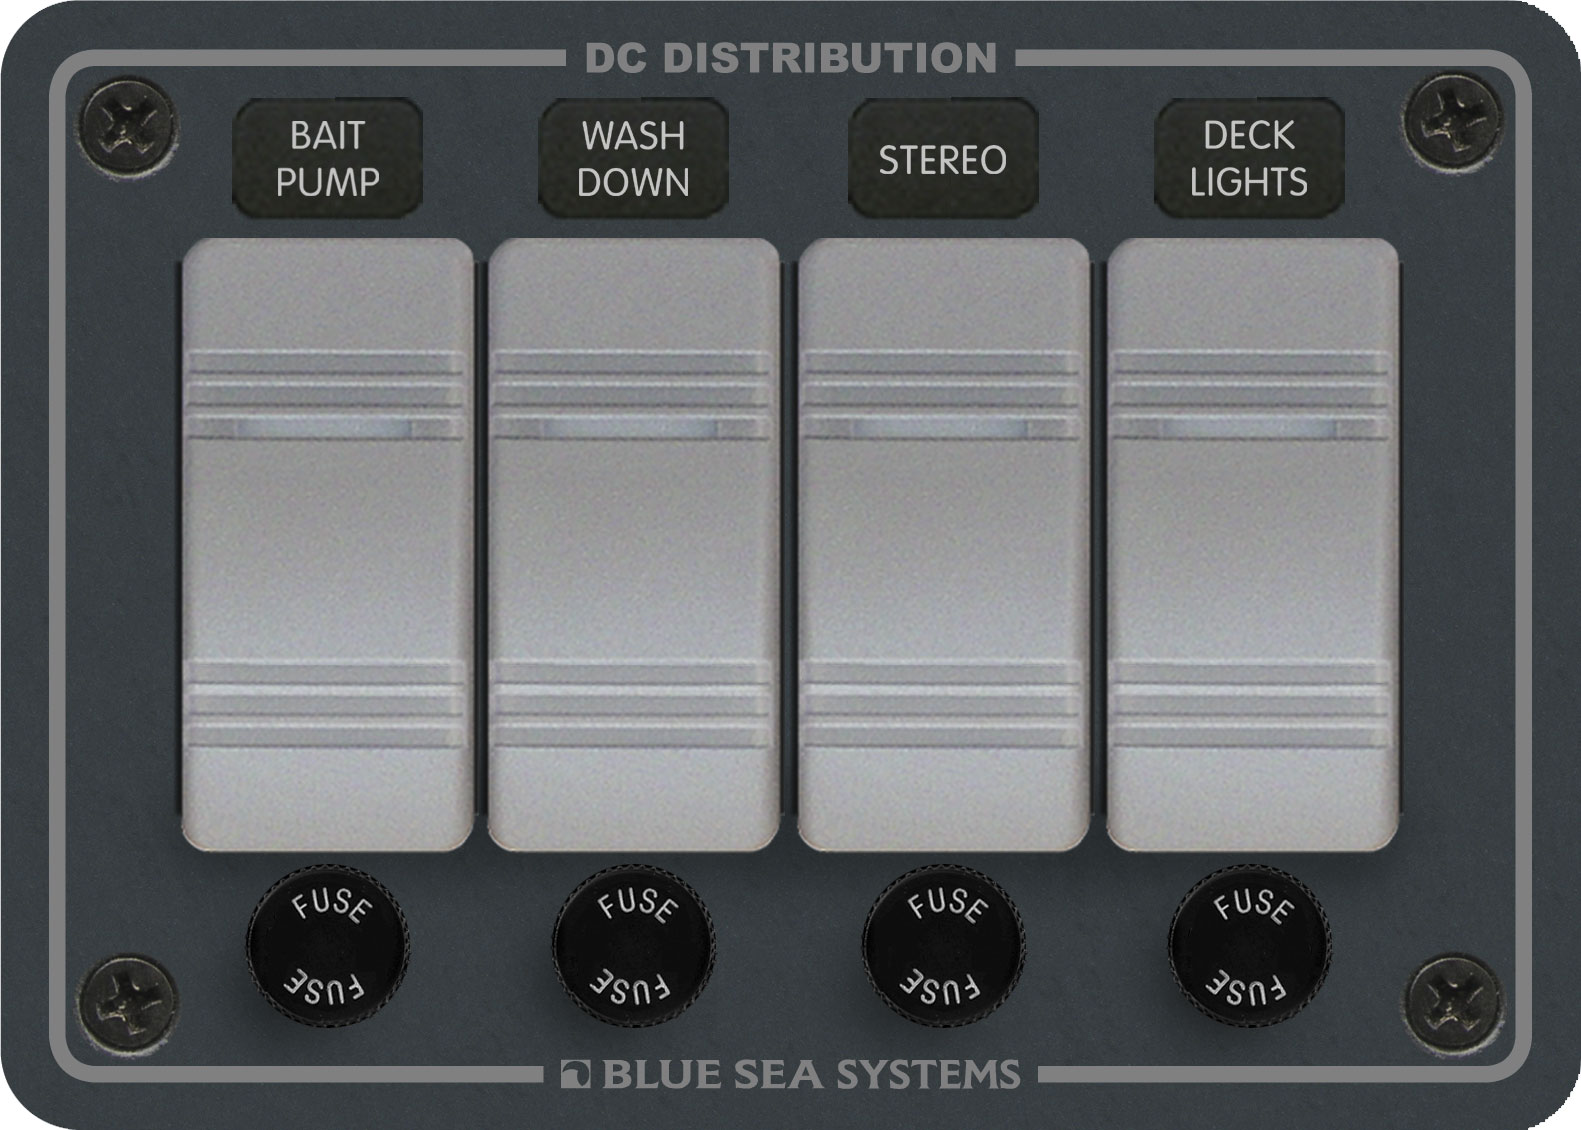 dc fuse panel for rv wiring diagram u2022 rh tinyforge co